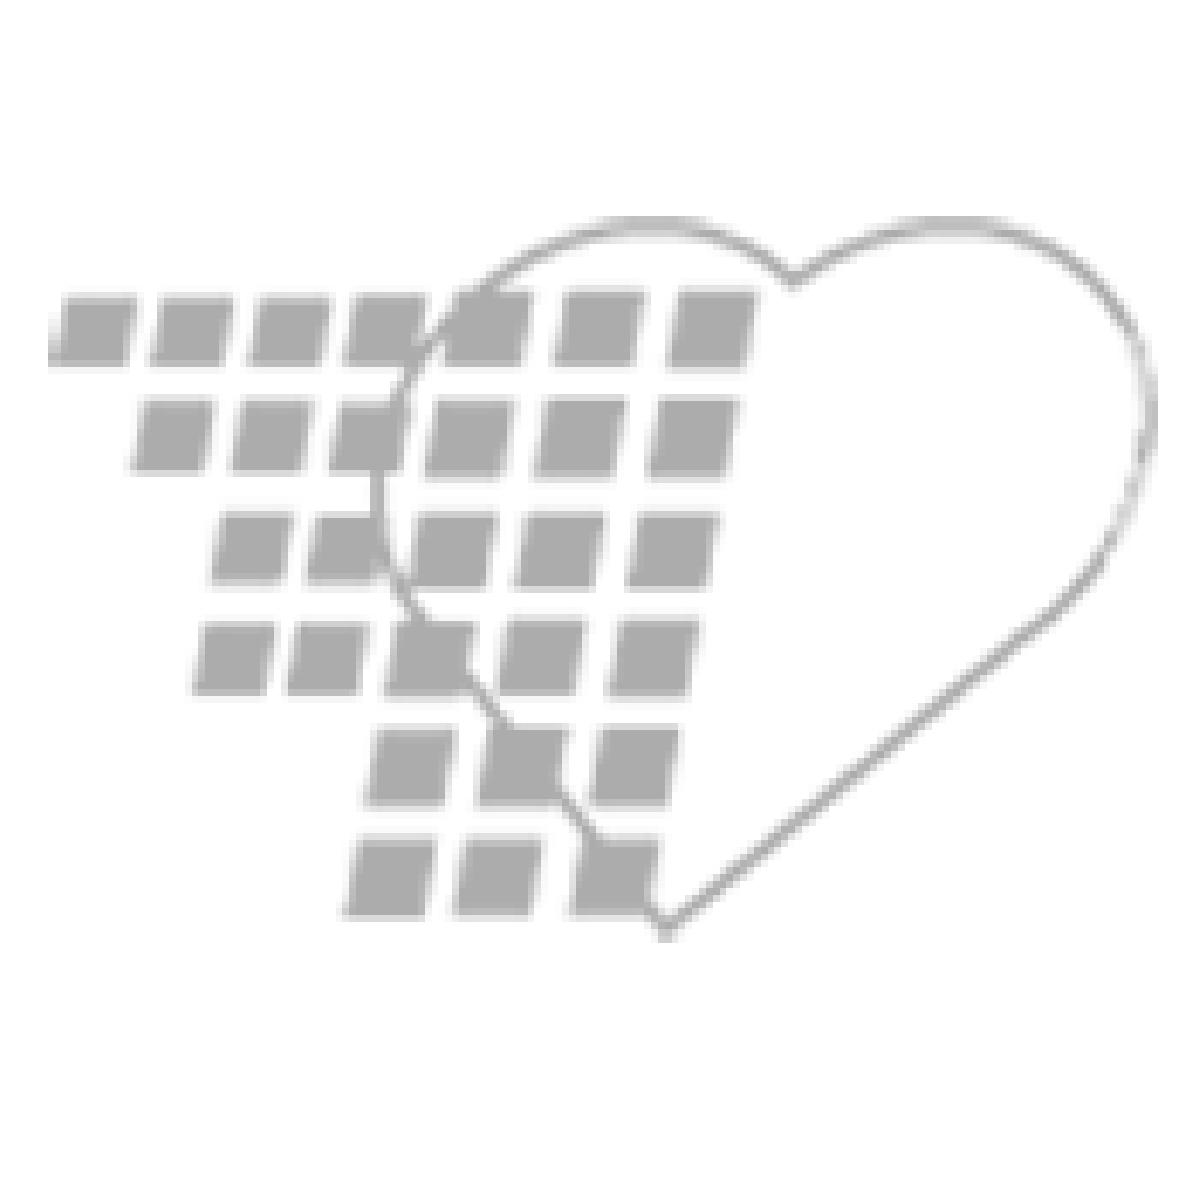 09-79-4502 - Gaumard CD Perinatal Monitors Simulation Software with Scenario Builder Non-Returnable